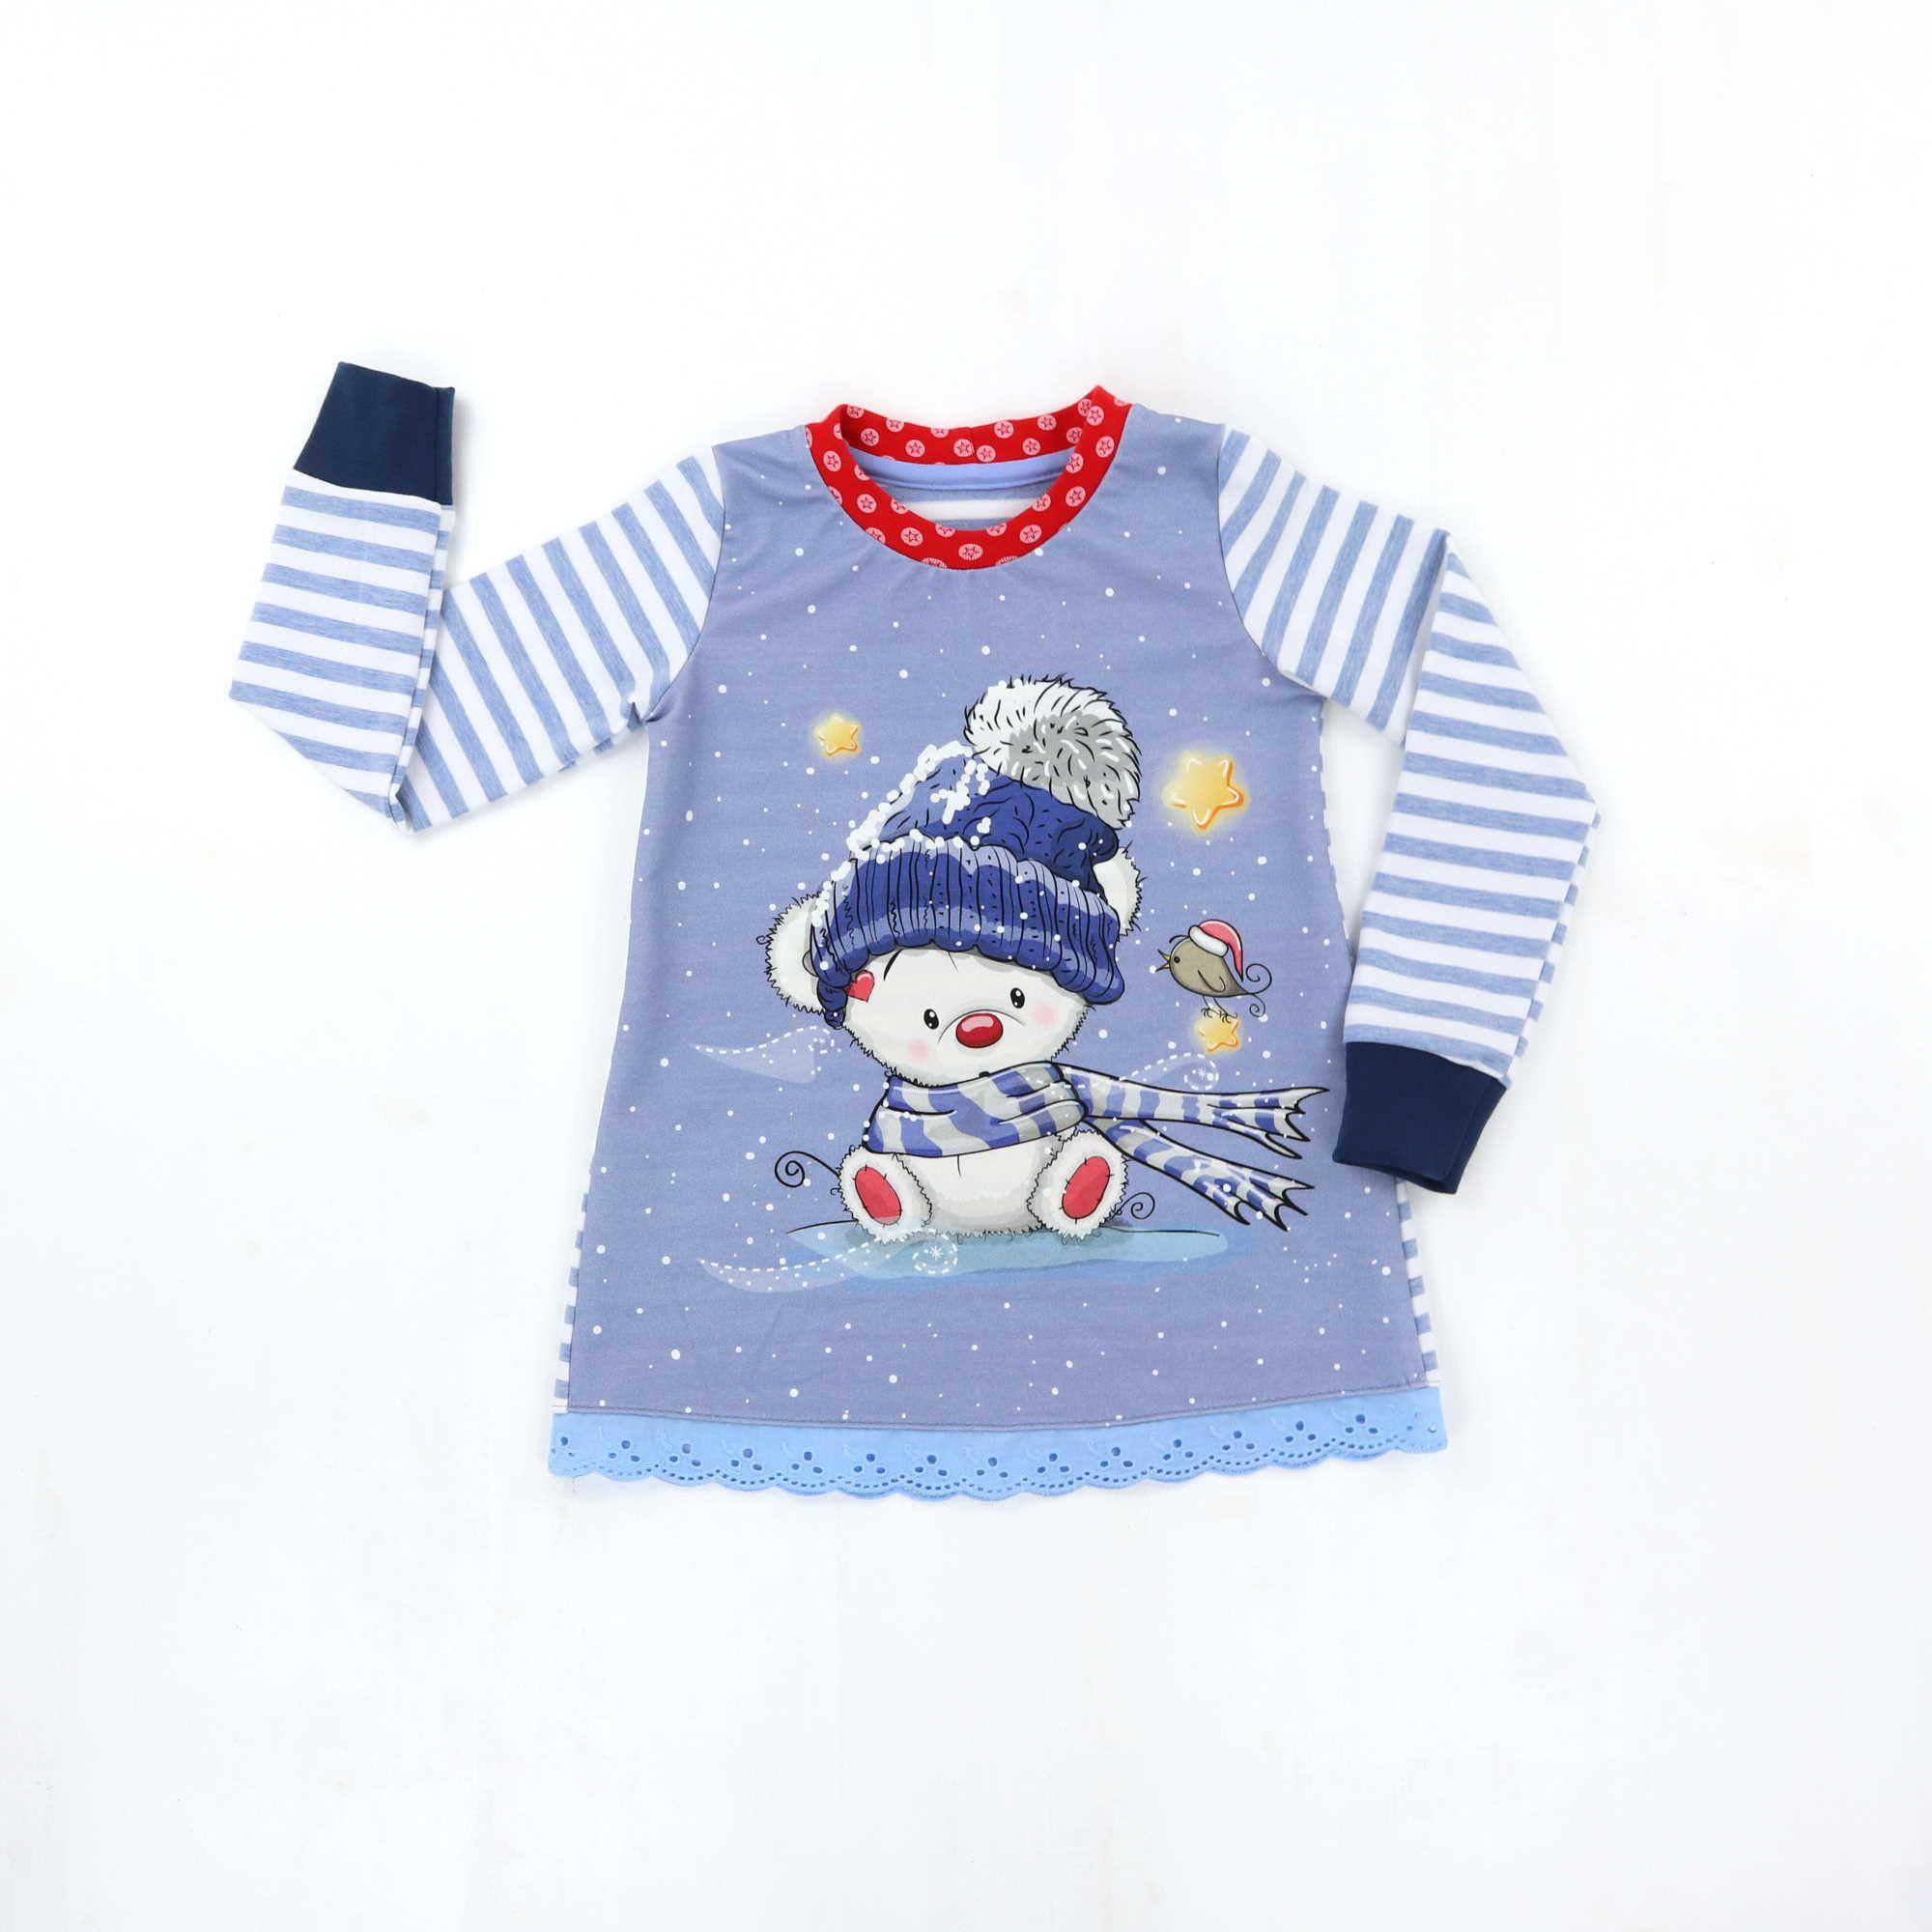 Madchenshirt 110 Tunika Teddybar Longshirt Sweat Tunika Kleid Madchen Winterteddy Mit Bildern Longshirt Madchen Madchen Shirts